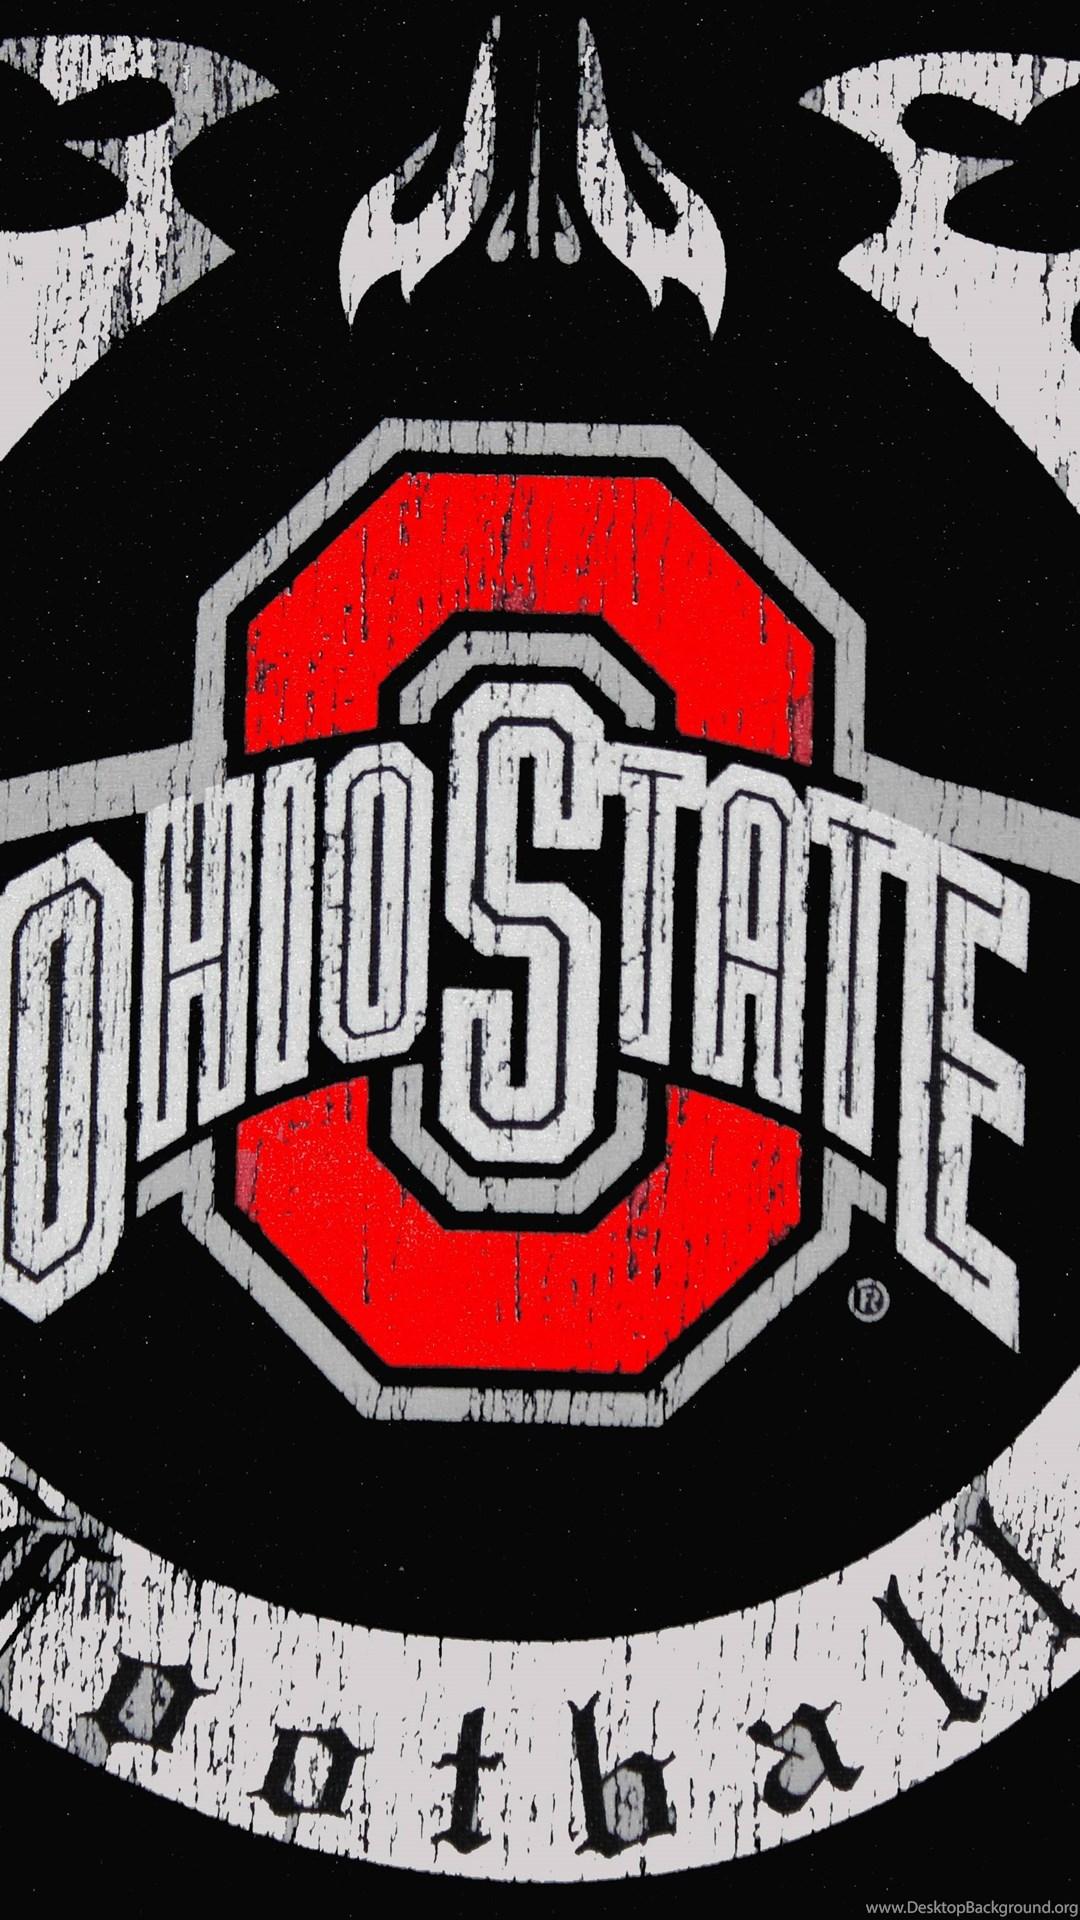 Ohio state buckeyes wallpapers ohio state football wallpapers desktop background - Ohio state football wallpaper ...